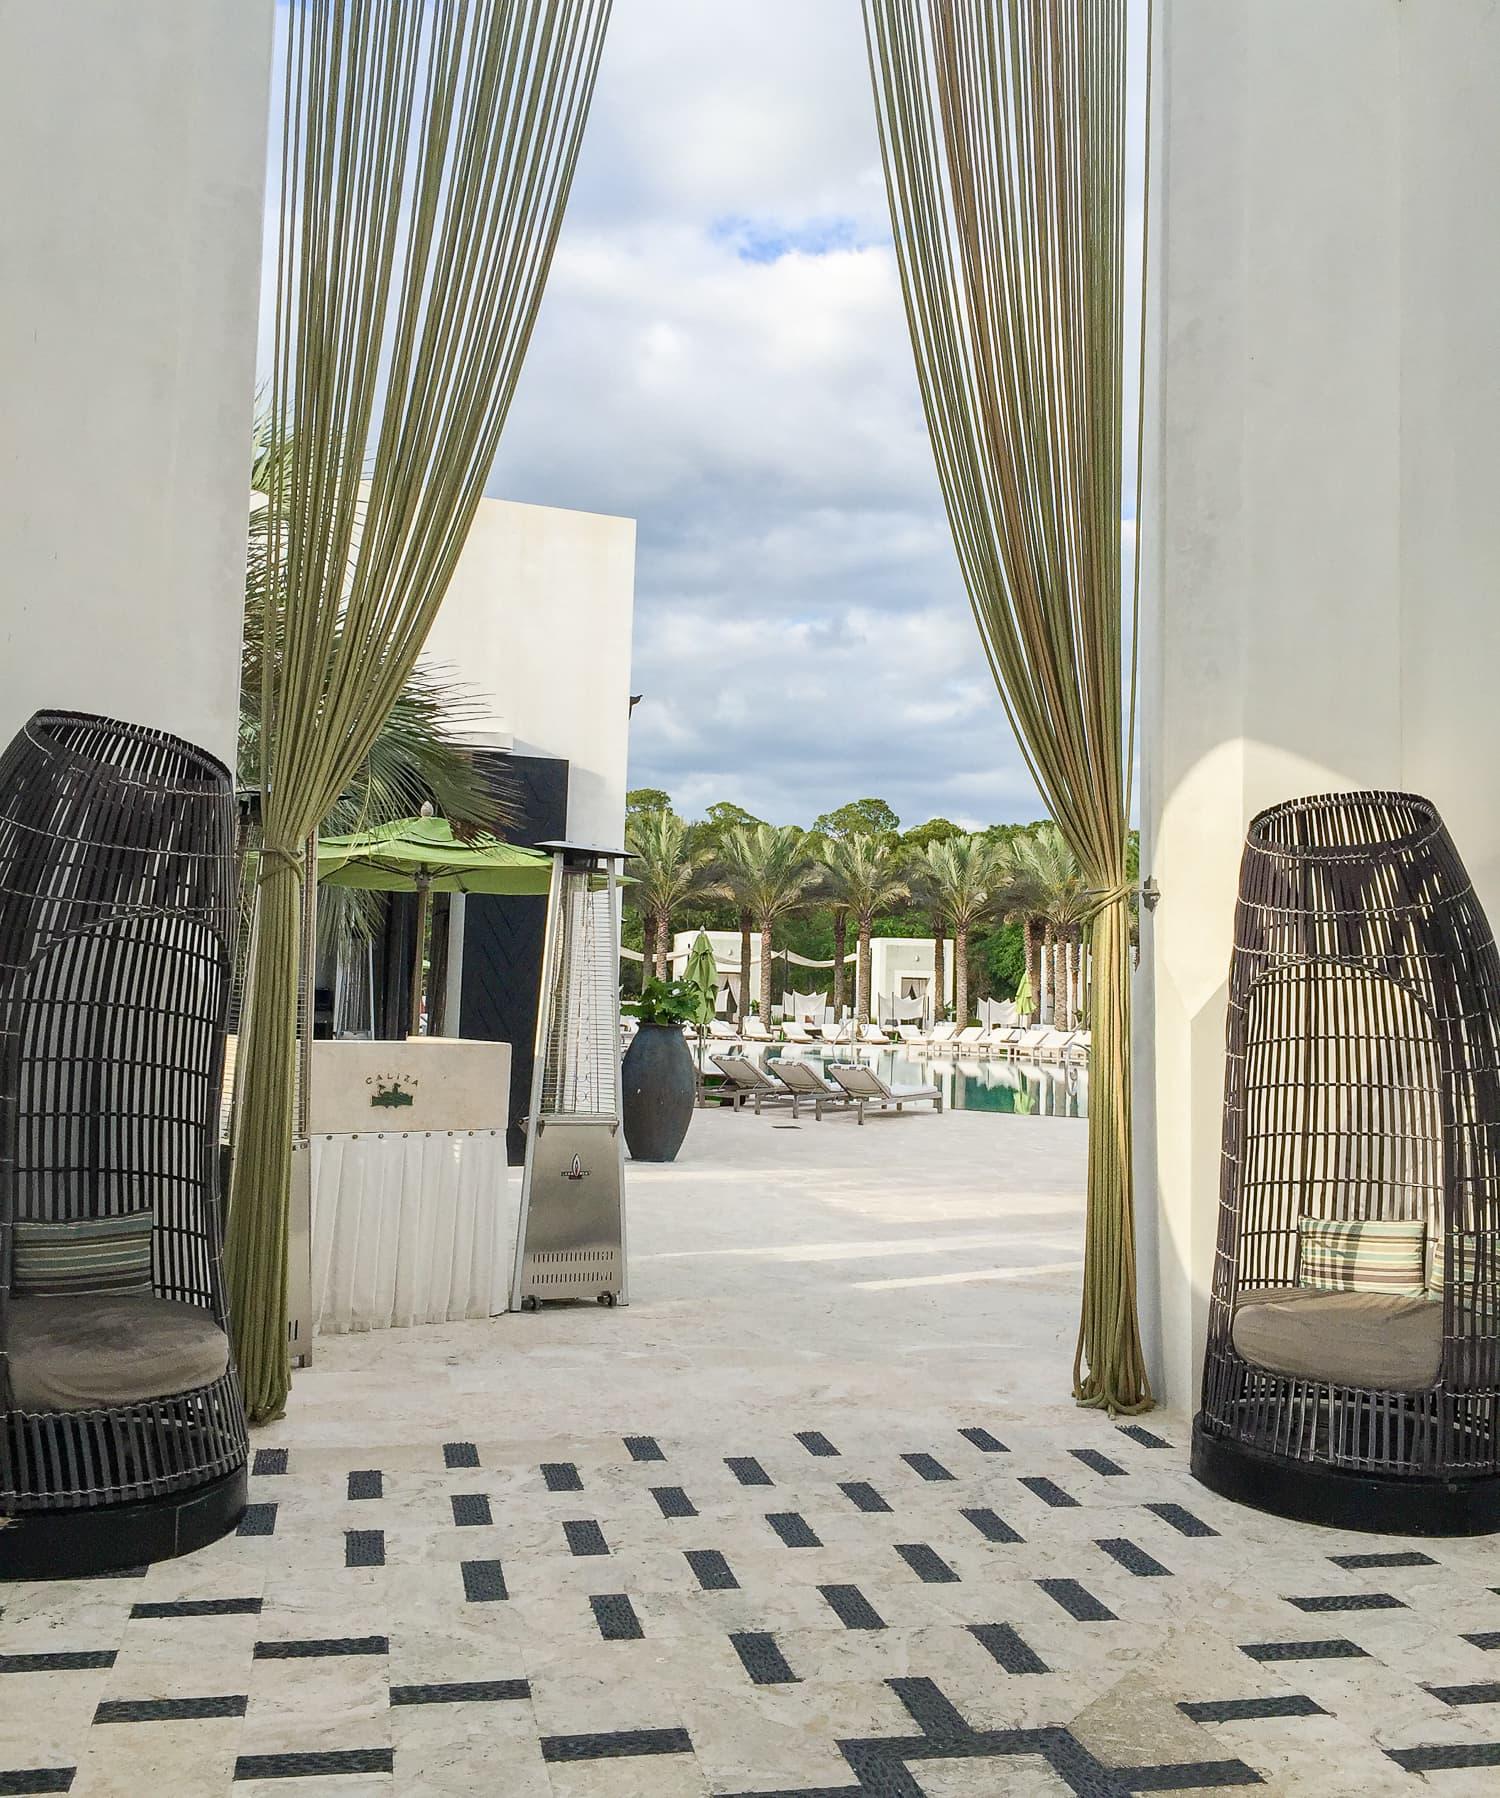 caliza-pool-restaurant-alys-beach-florida--2